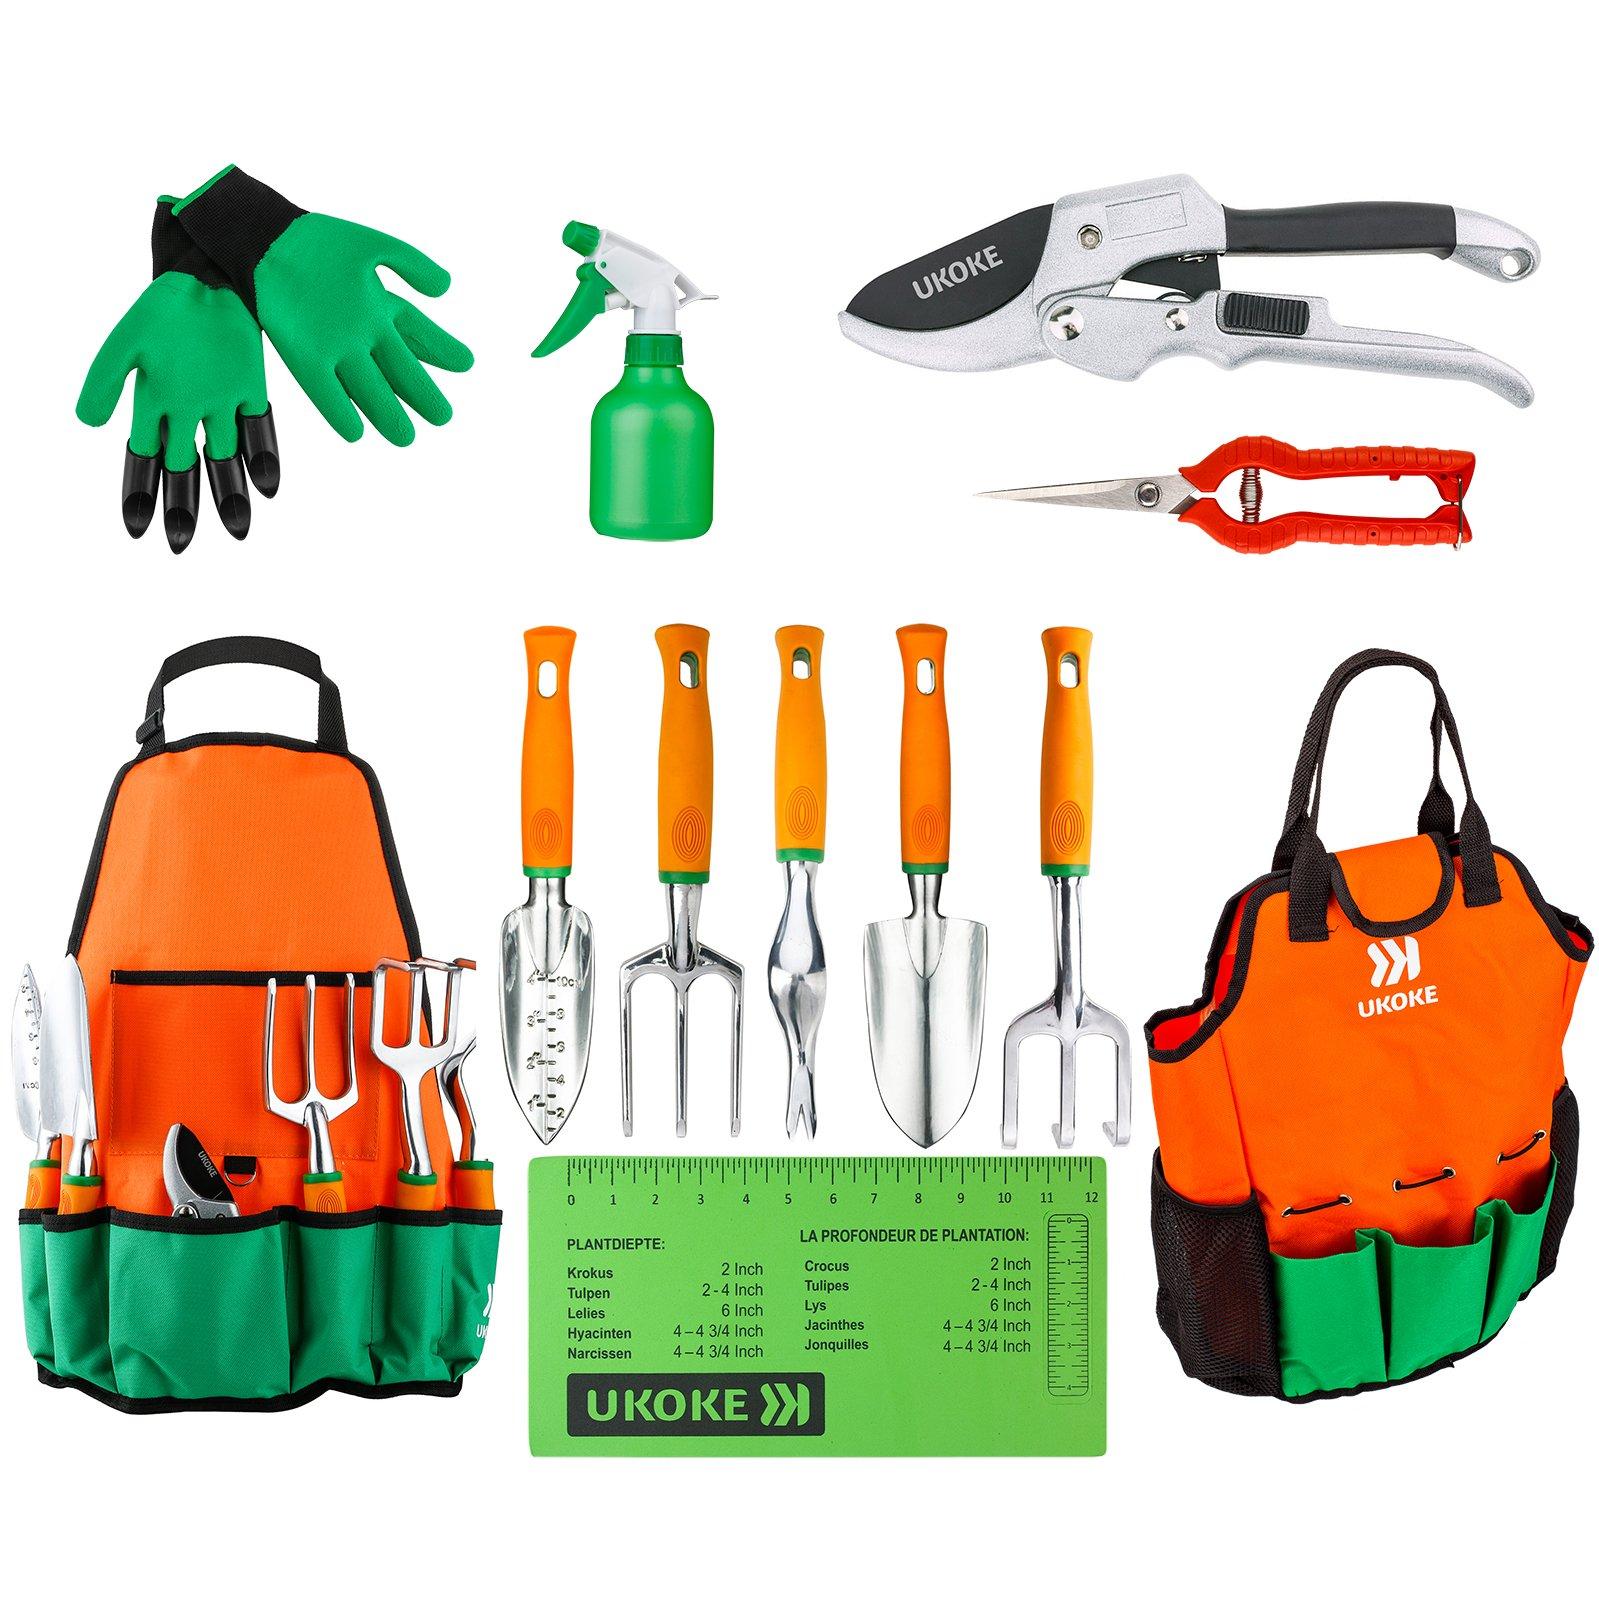 Garden Tool Set, UKOKE 12 Piece Aluminum Hand Tool Kit, Garden Canvas Apron with Storage Pocket, Outdoor Tool, Heavy Duty Gardening Work Set with Ergonomic Handle, Gardening Tools for women men